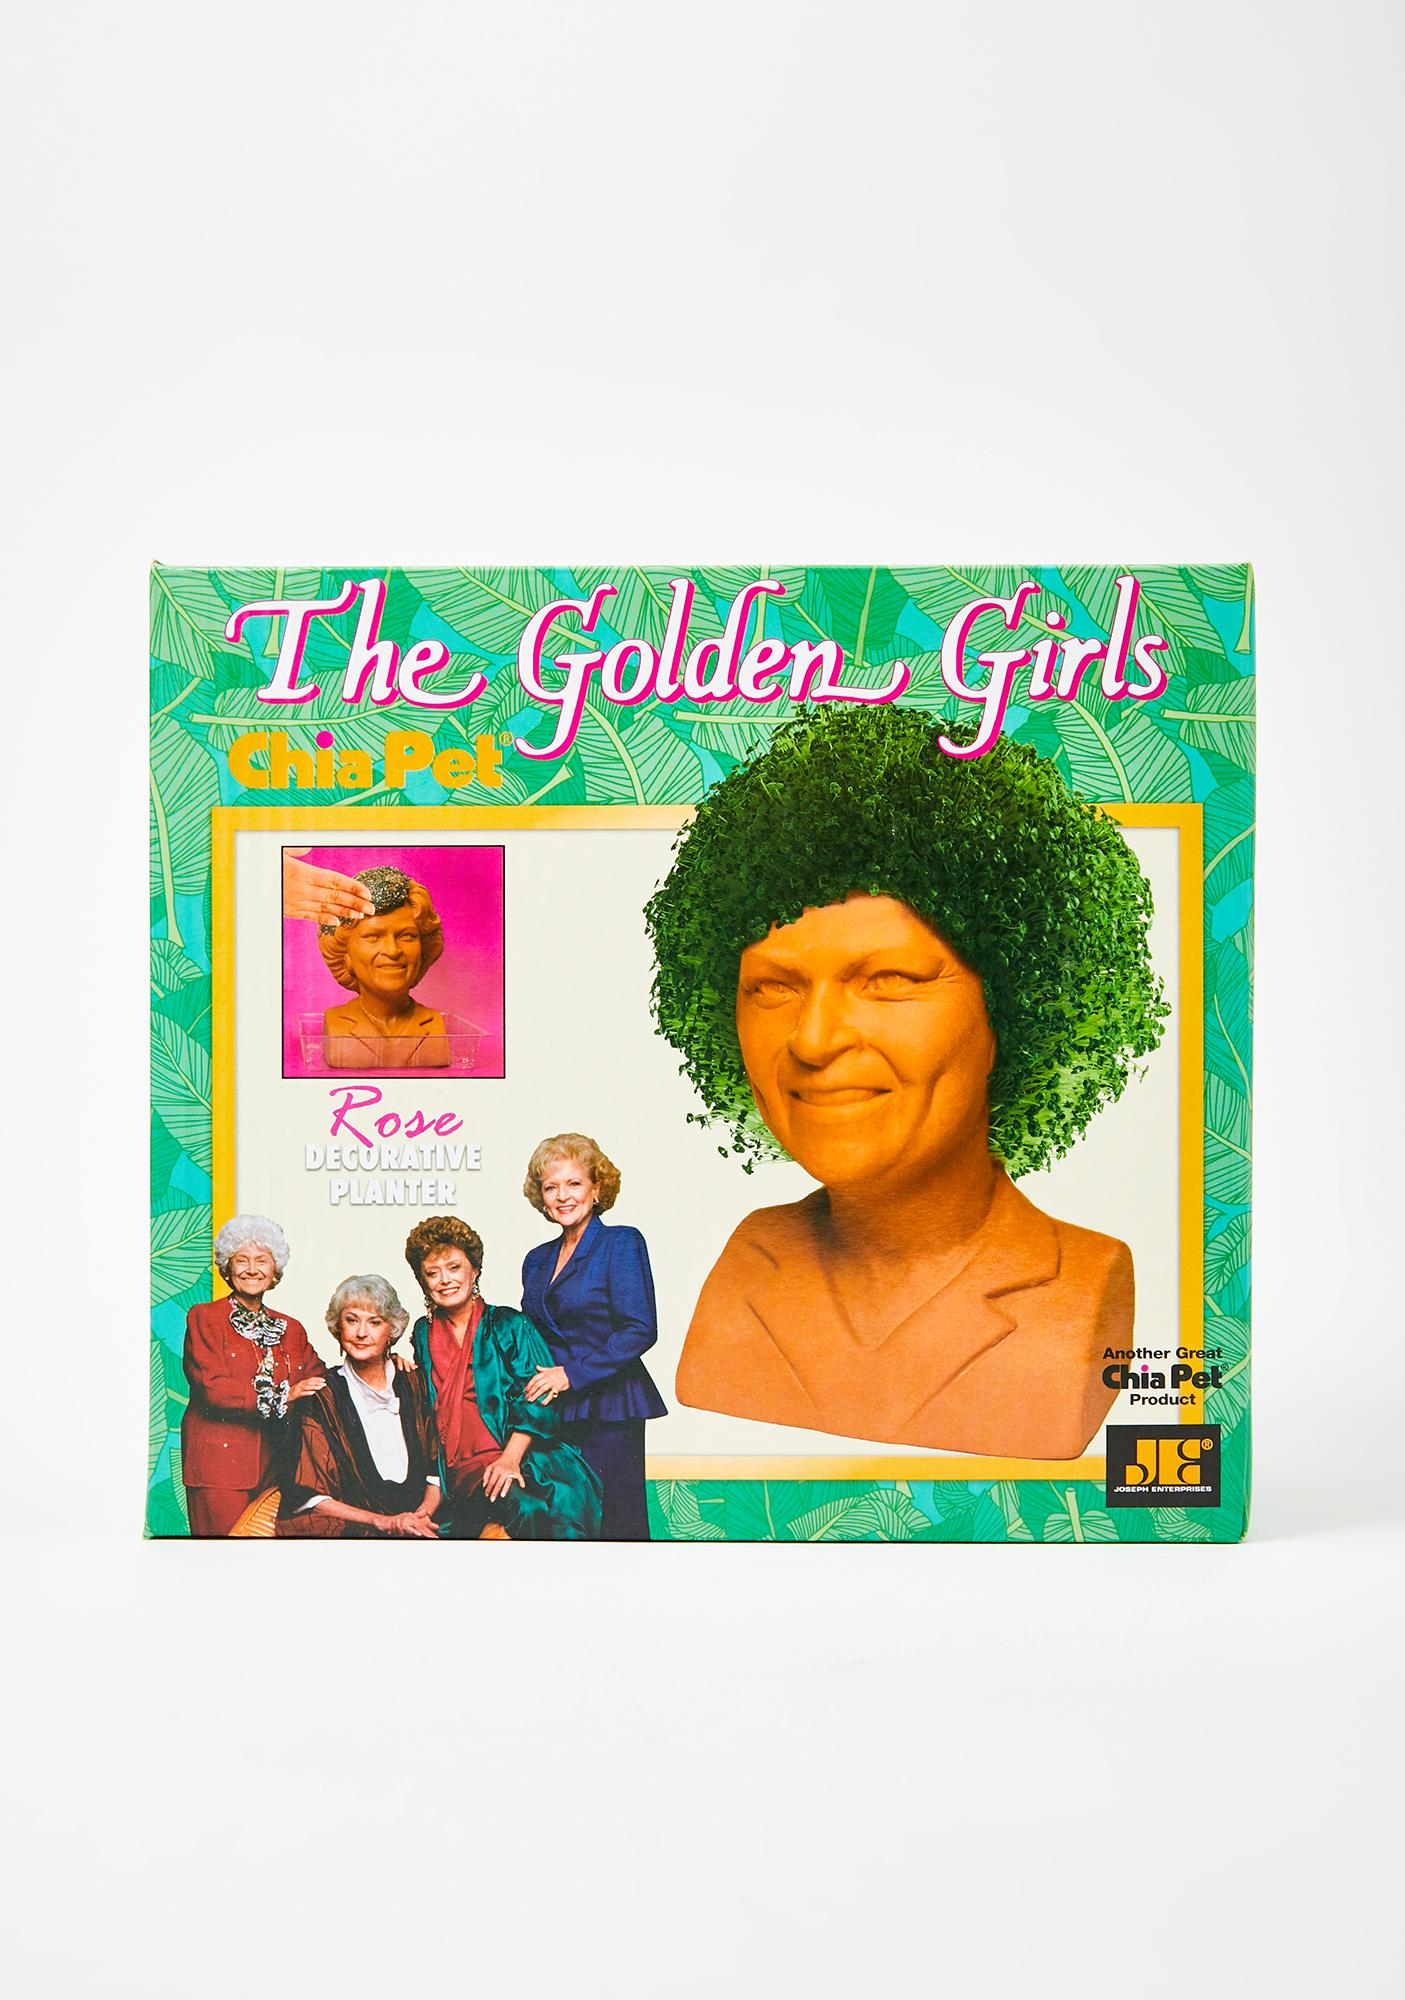 Chia Pet Golden Girls Rose Planter